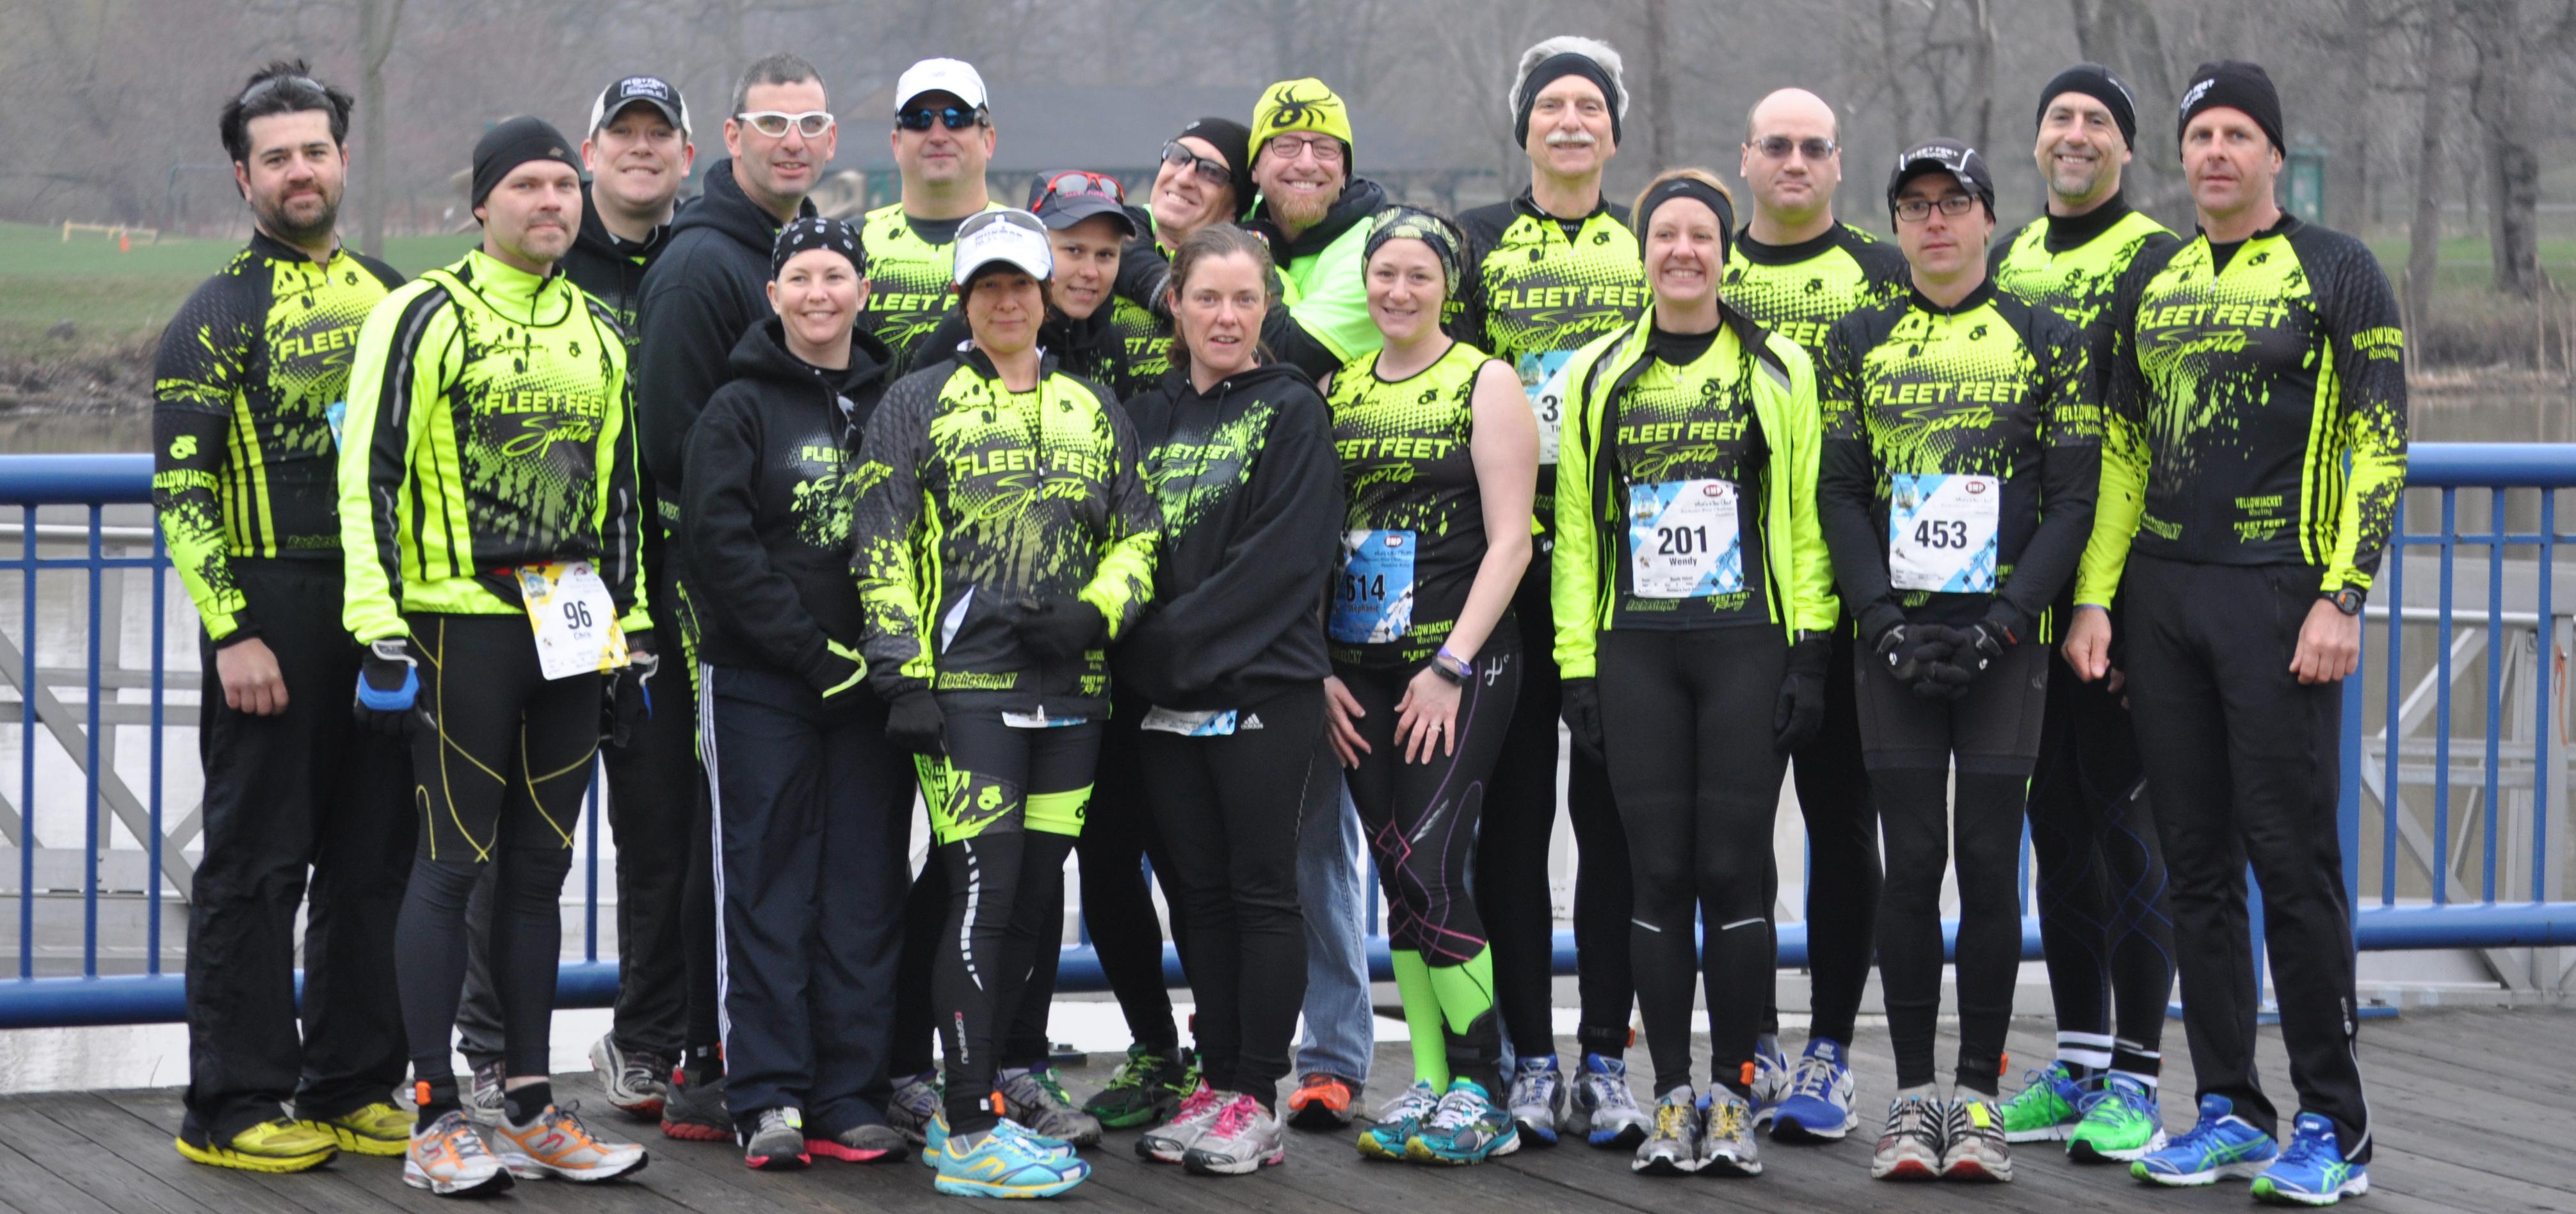 Brooks Fleet Feet Sports Race Team